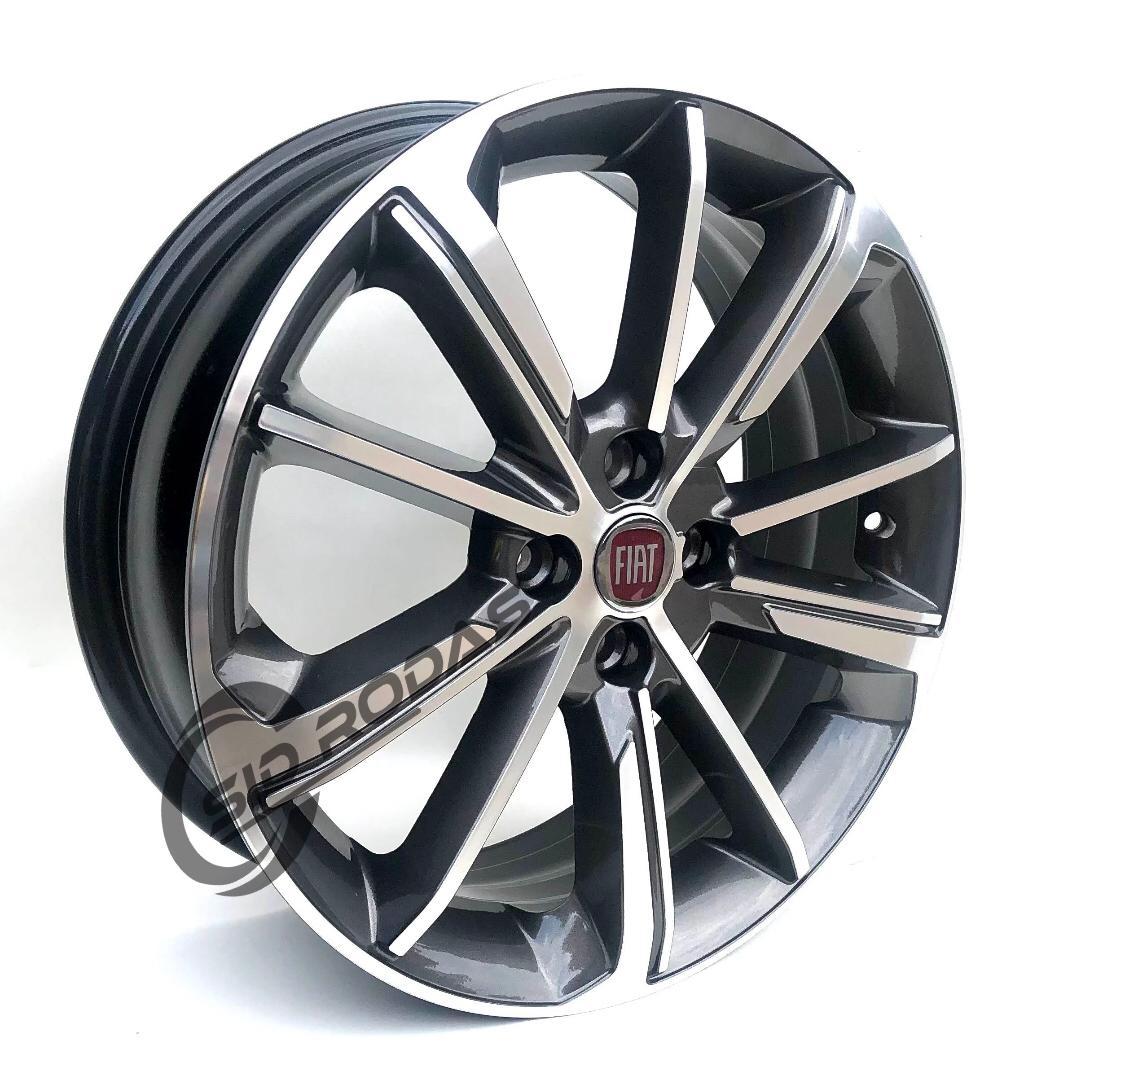 Kit 4 Rodas Aro 17x6 Fiat Cronos 4x98 Et38 GD Krmai S03